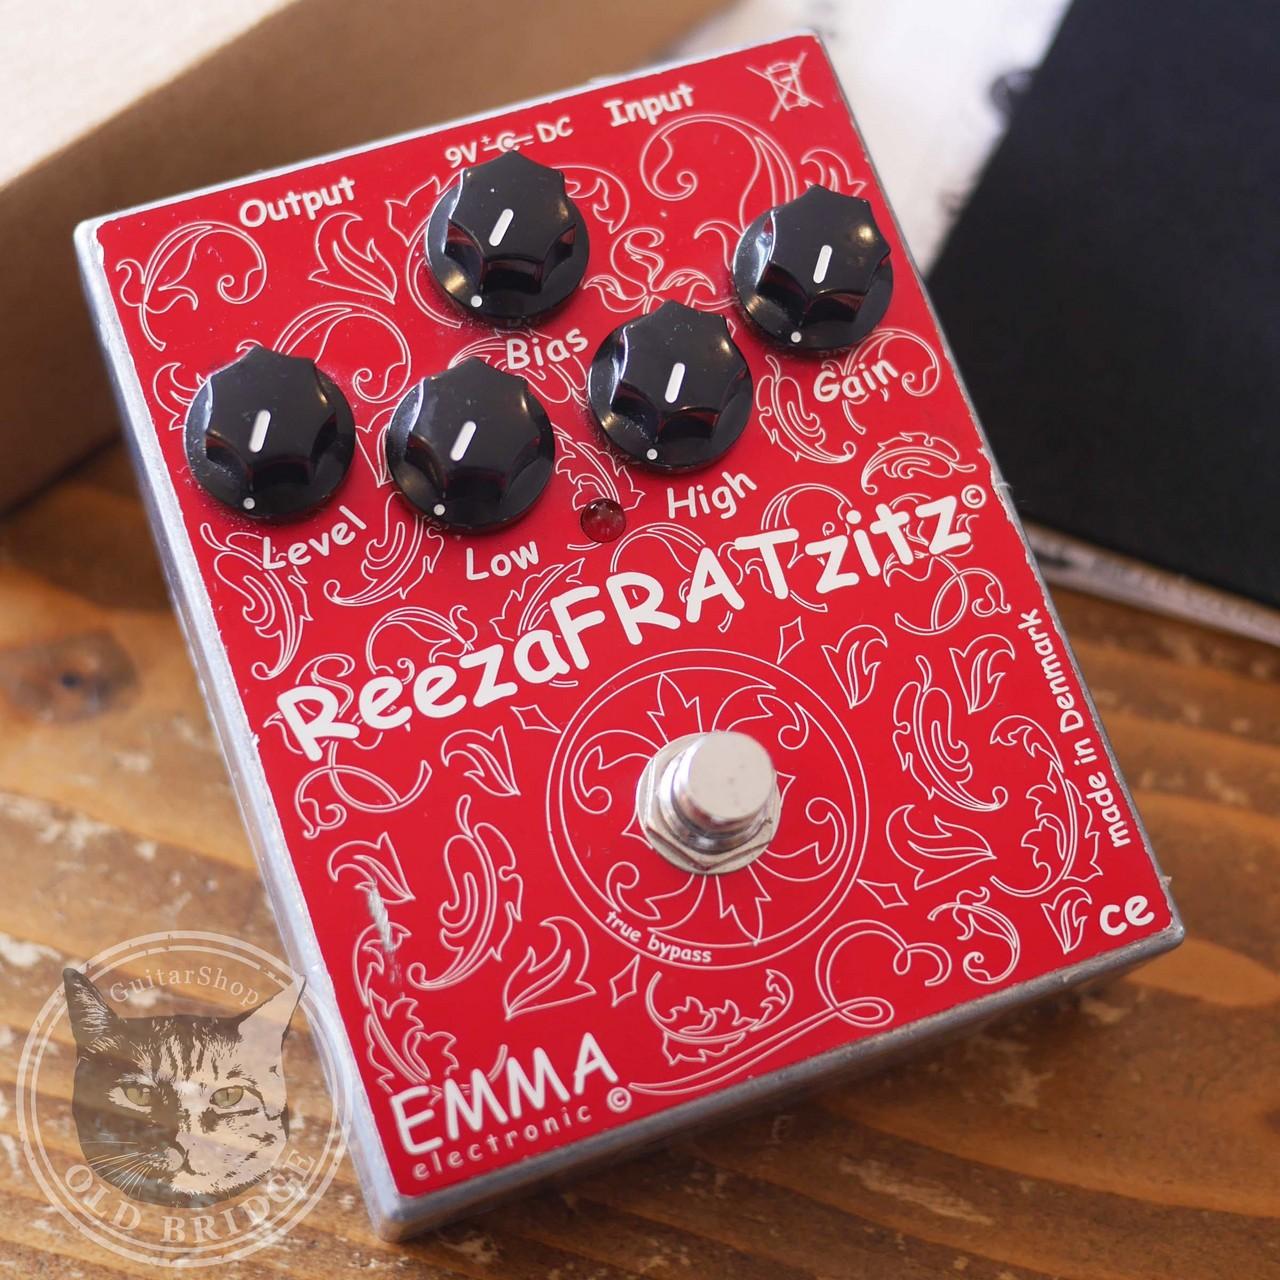 EMMA electronic ReezaFRATzitz 2